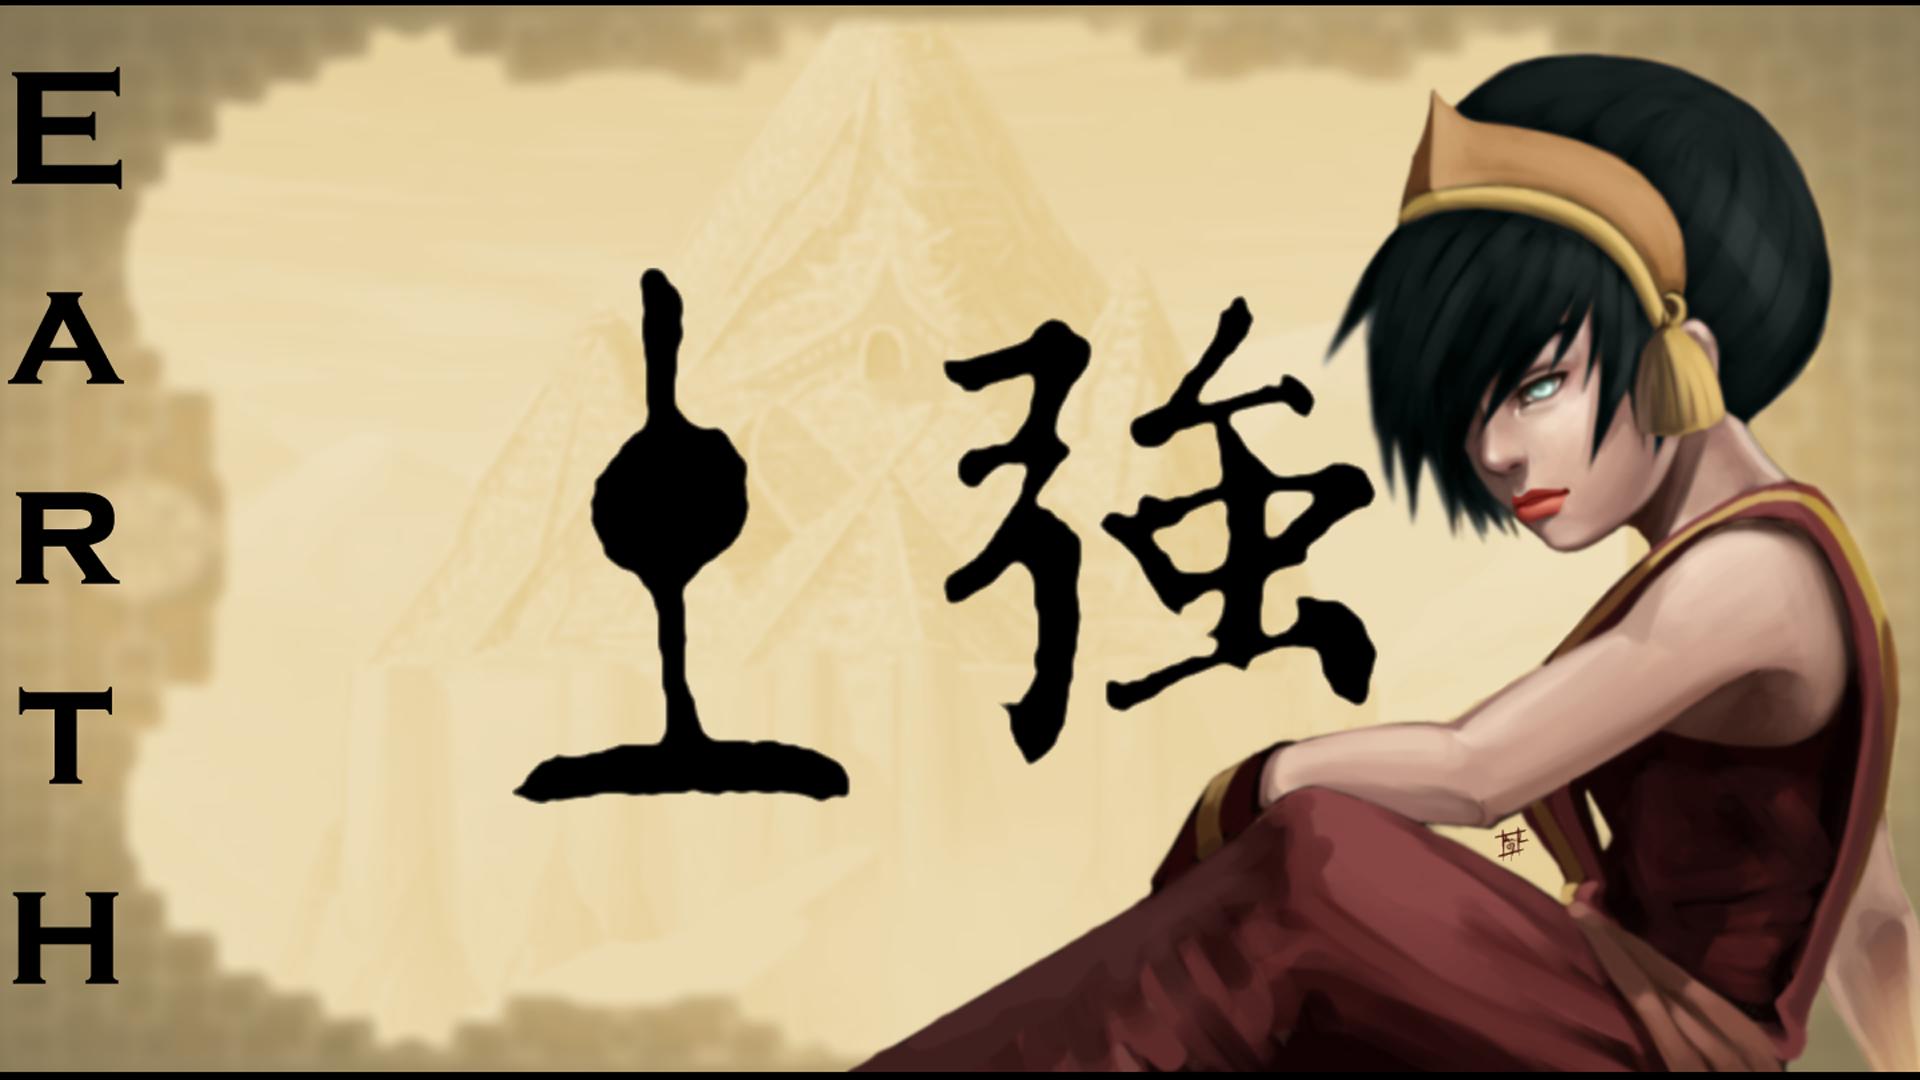 Wallpaper Illustration Anime Cartoon Avatar The Last